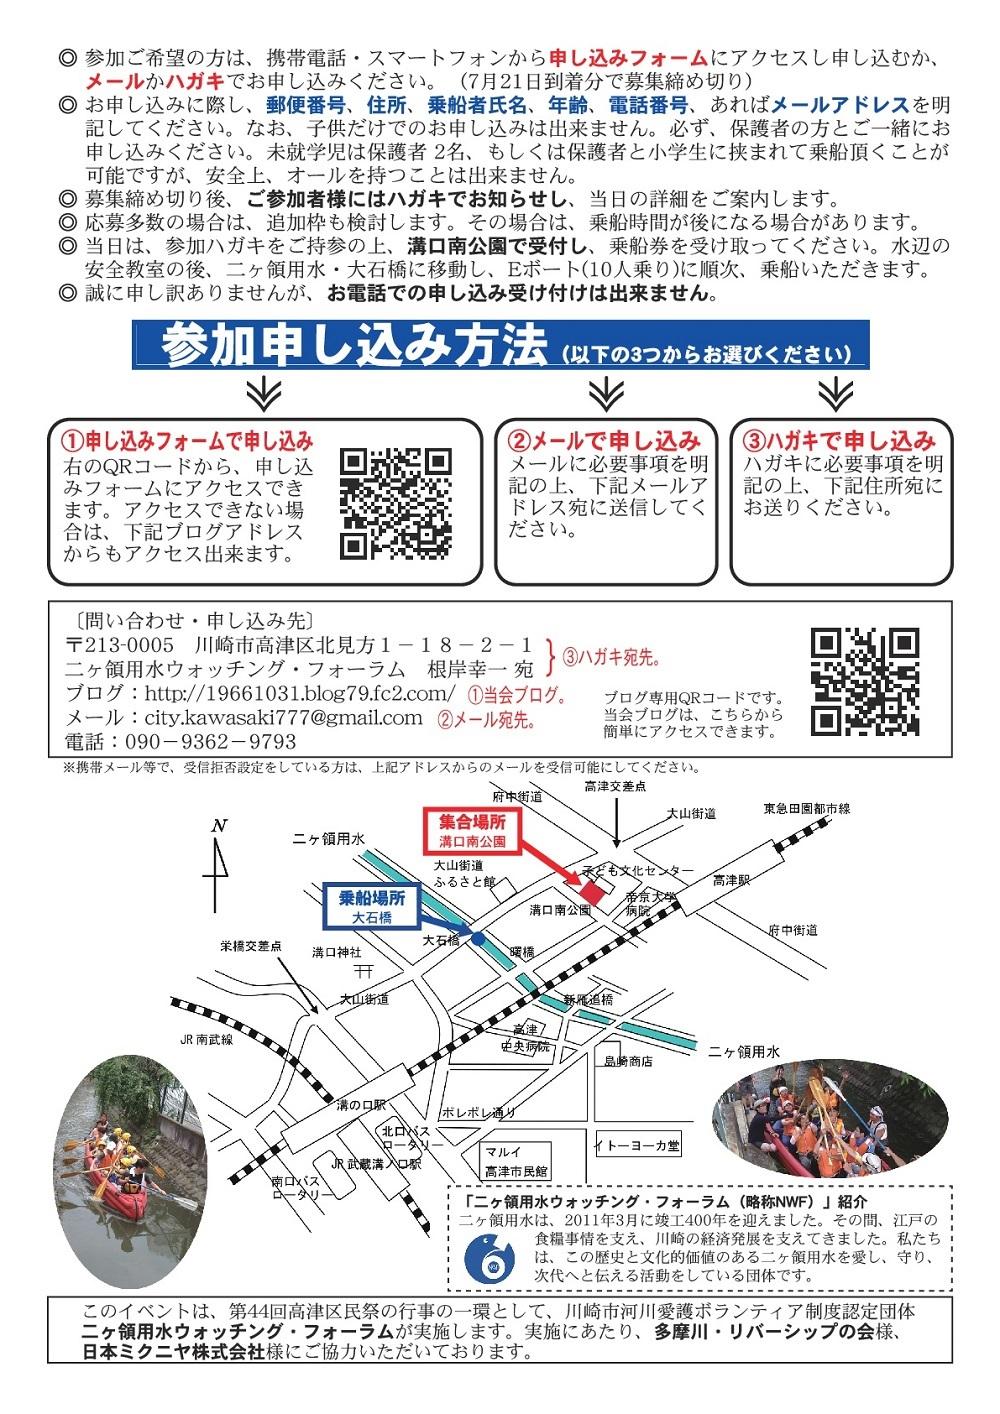 A4たて(裏)_アウトライン_44高津区民祭_20170730-001